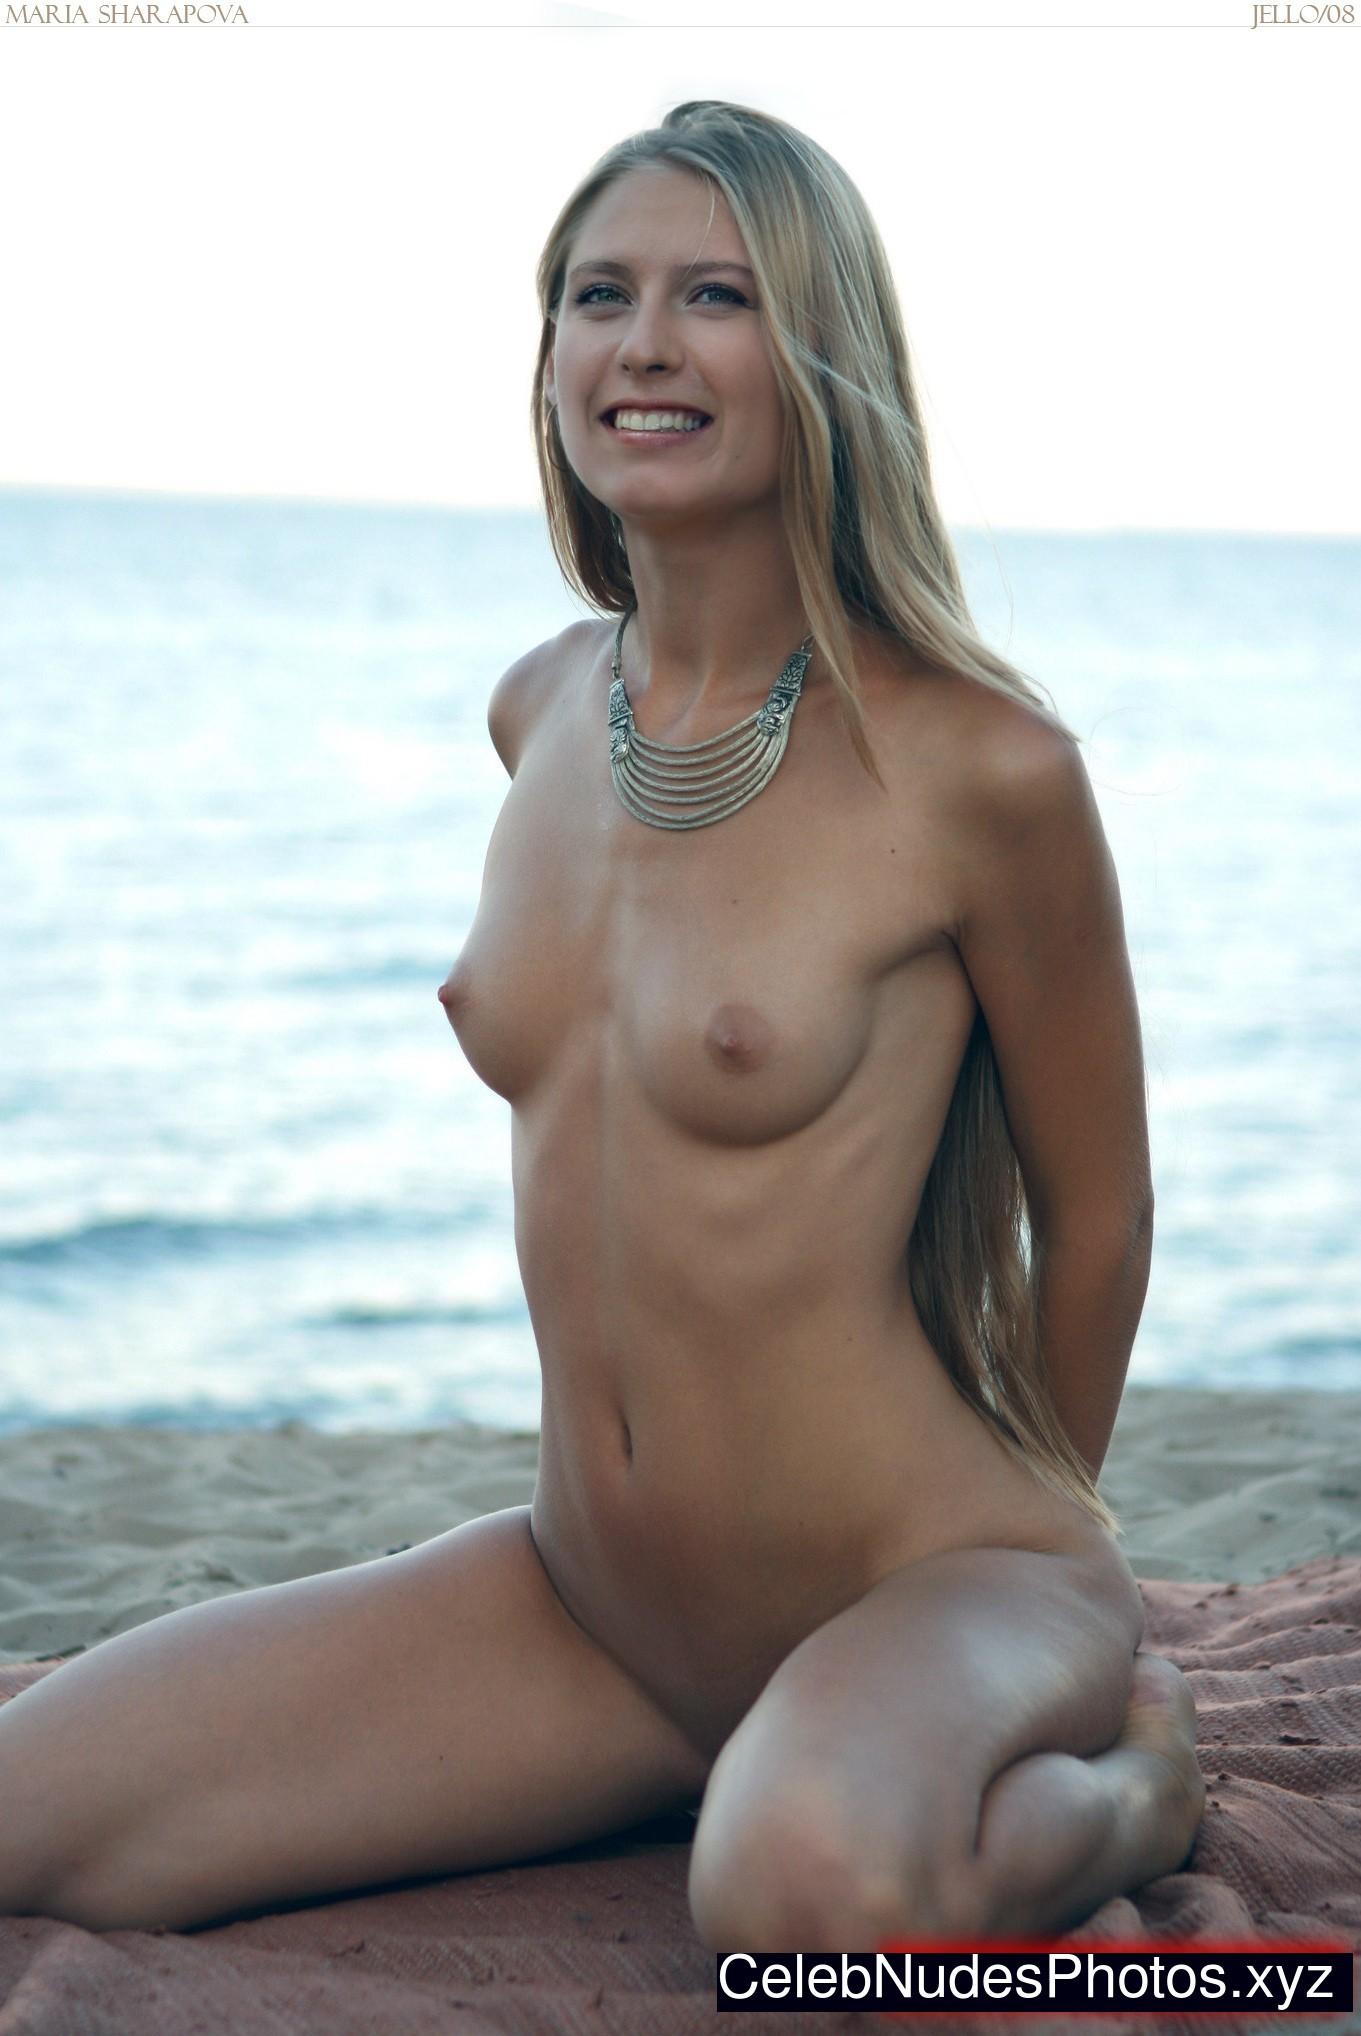 Something Maria sharapova nude free something is